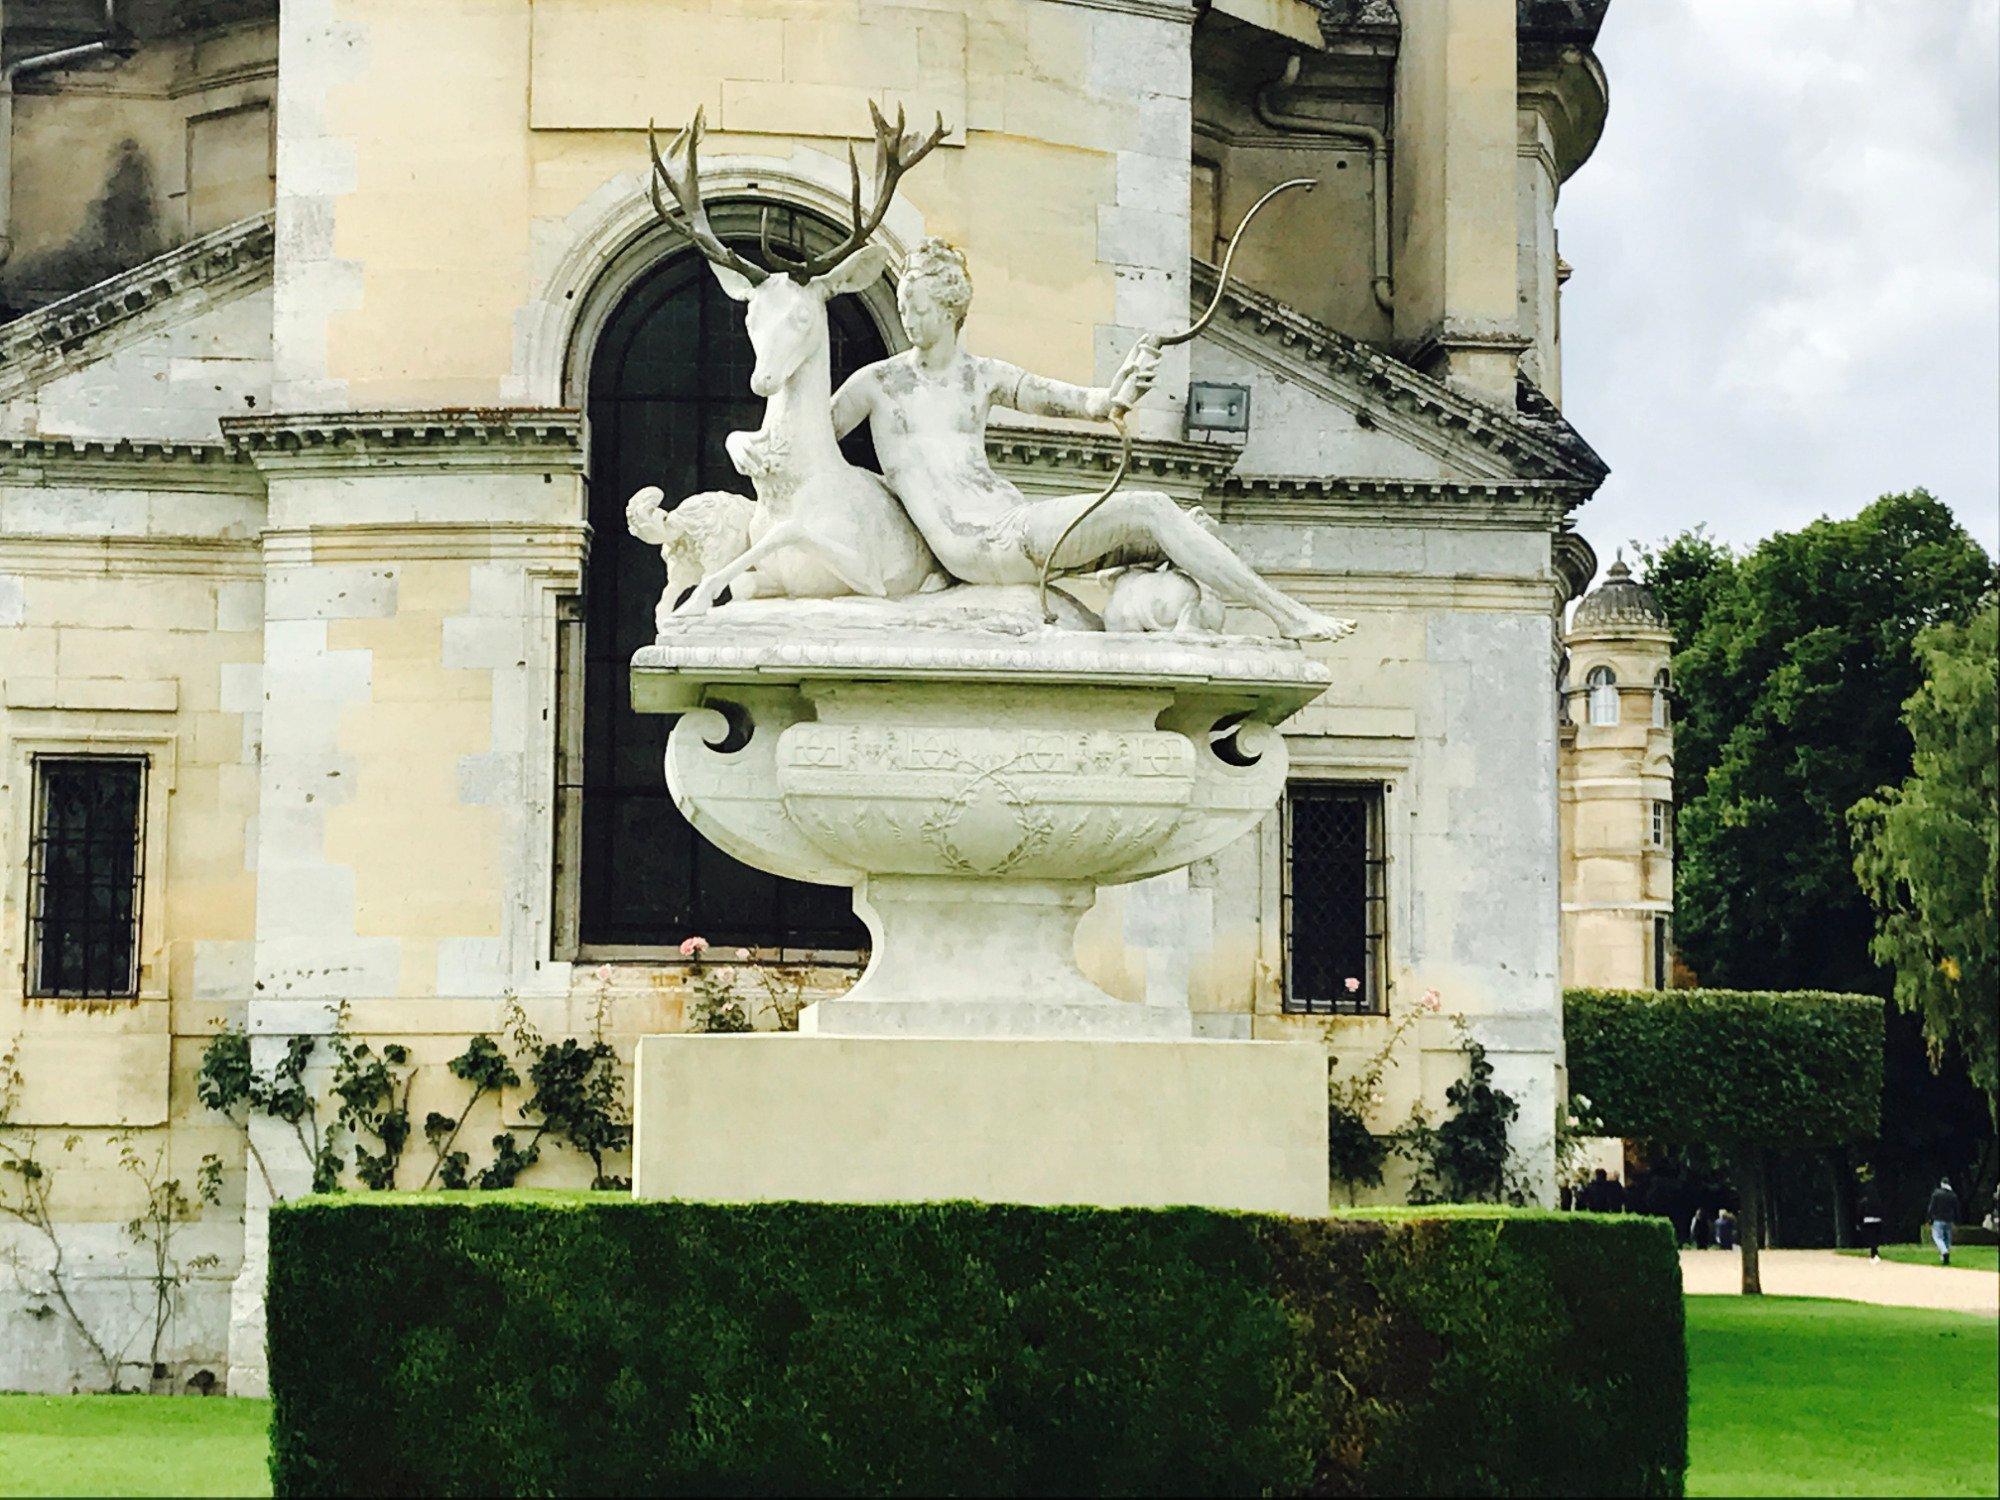 497-chateau-d'anet.jpg